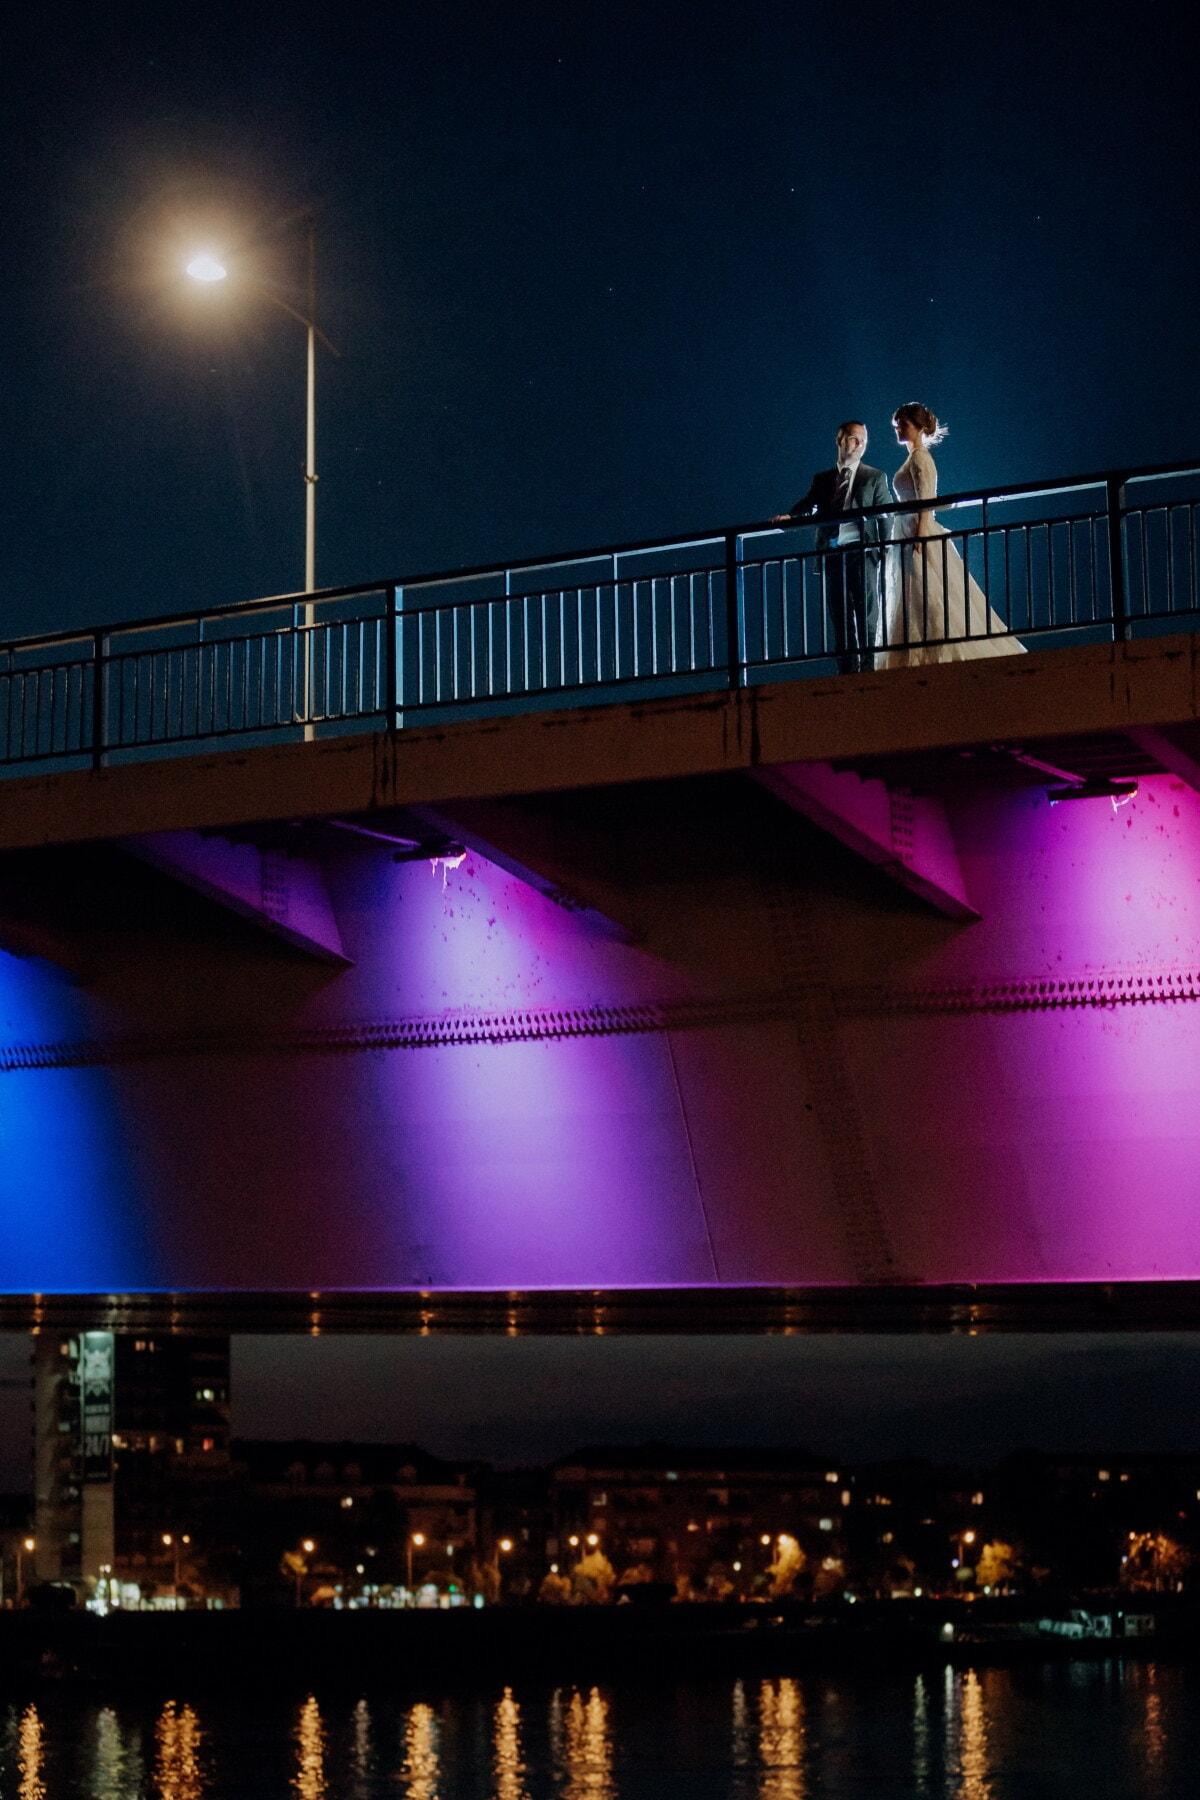 romantic, bridge, night, love date, man, young woman, lights, light, city, water